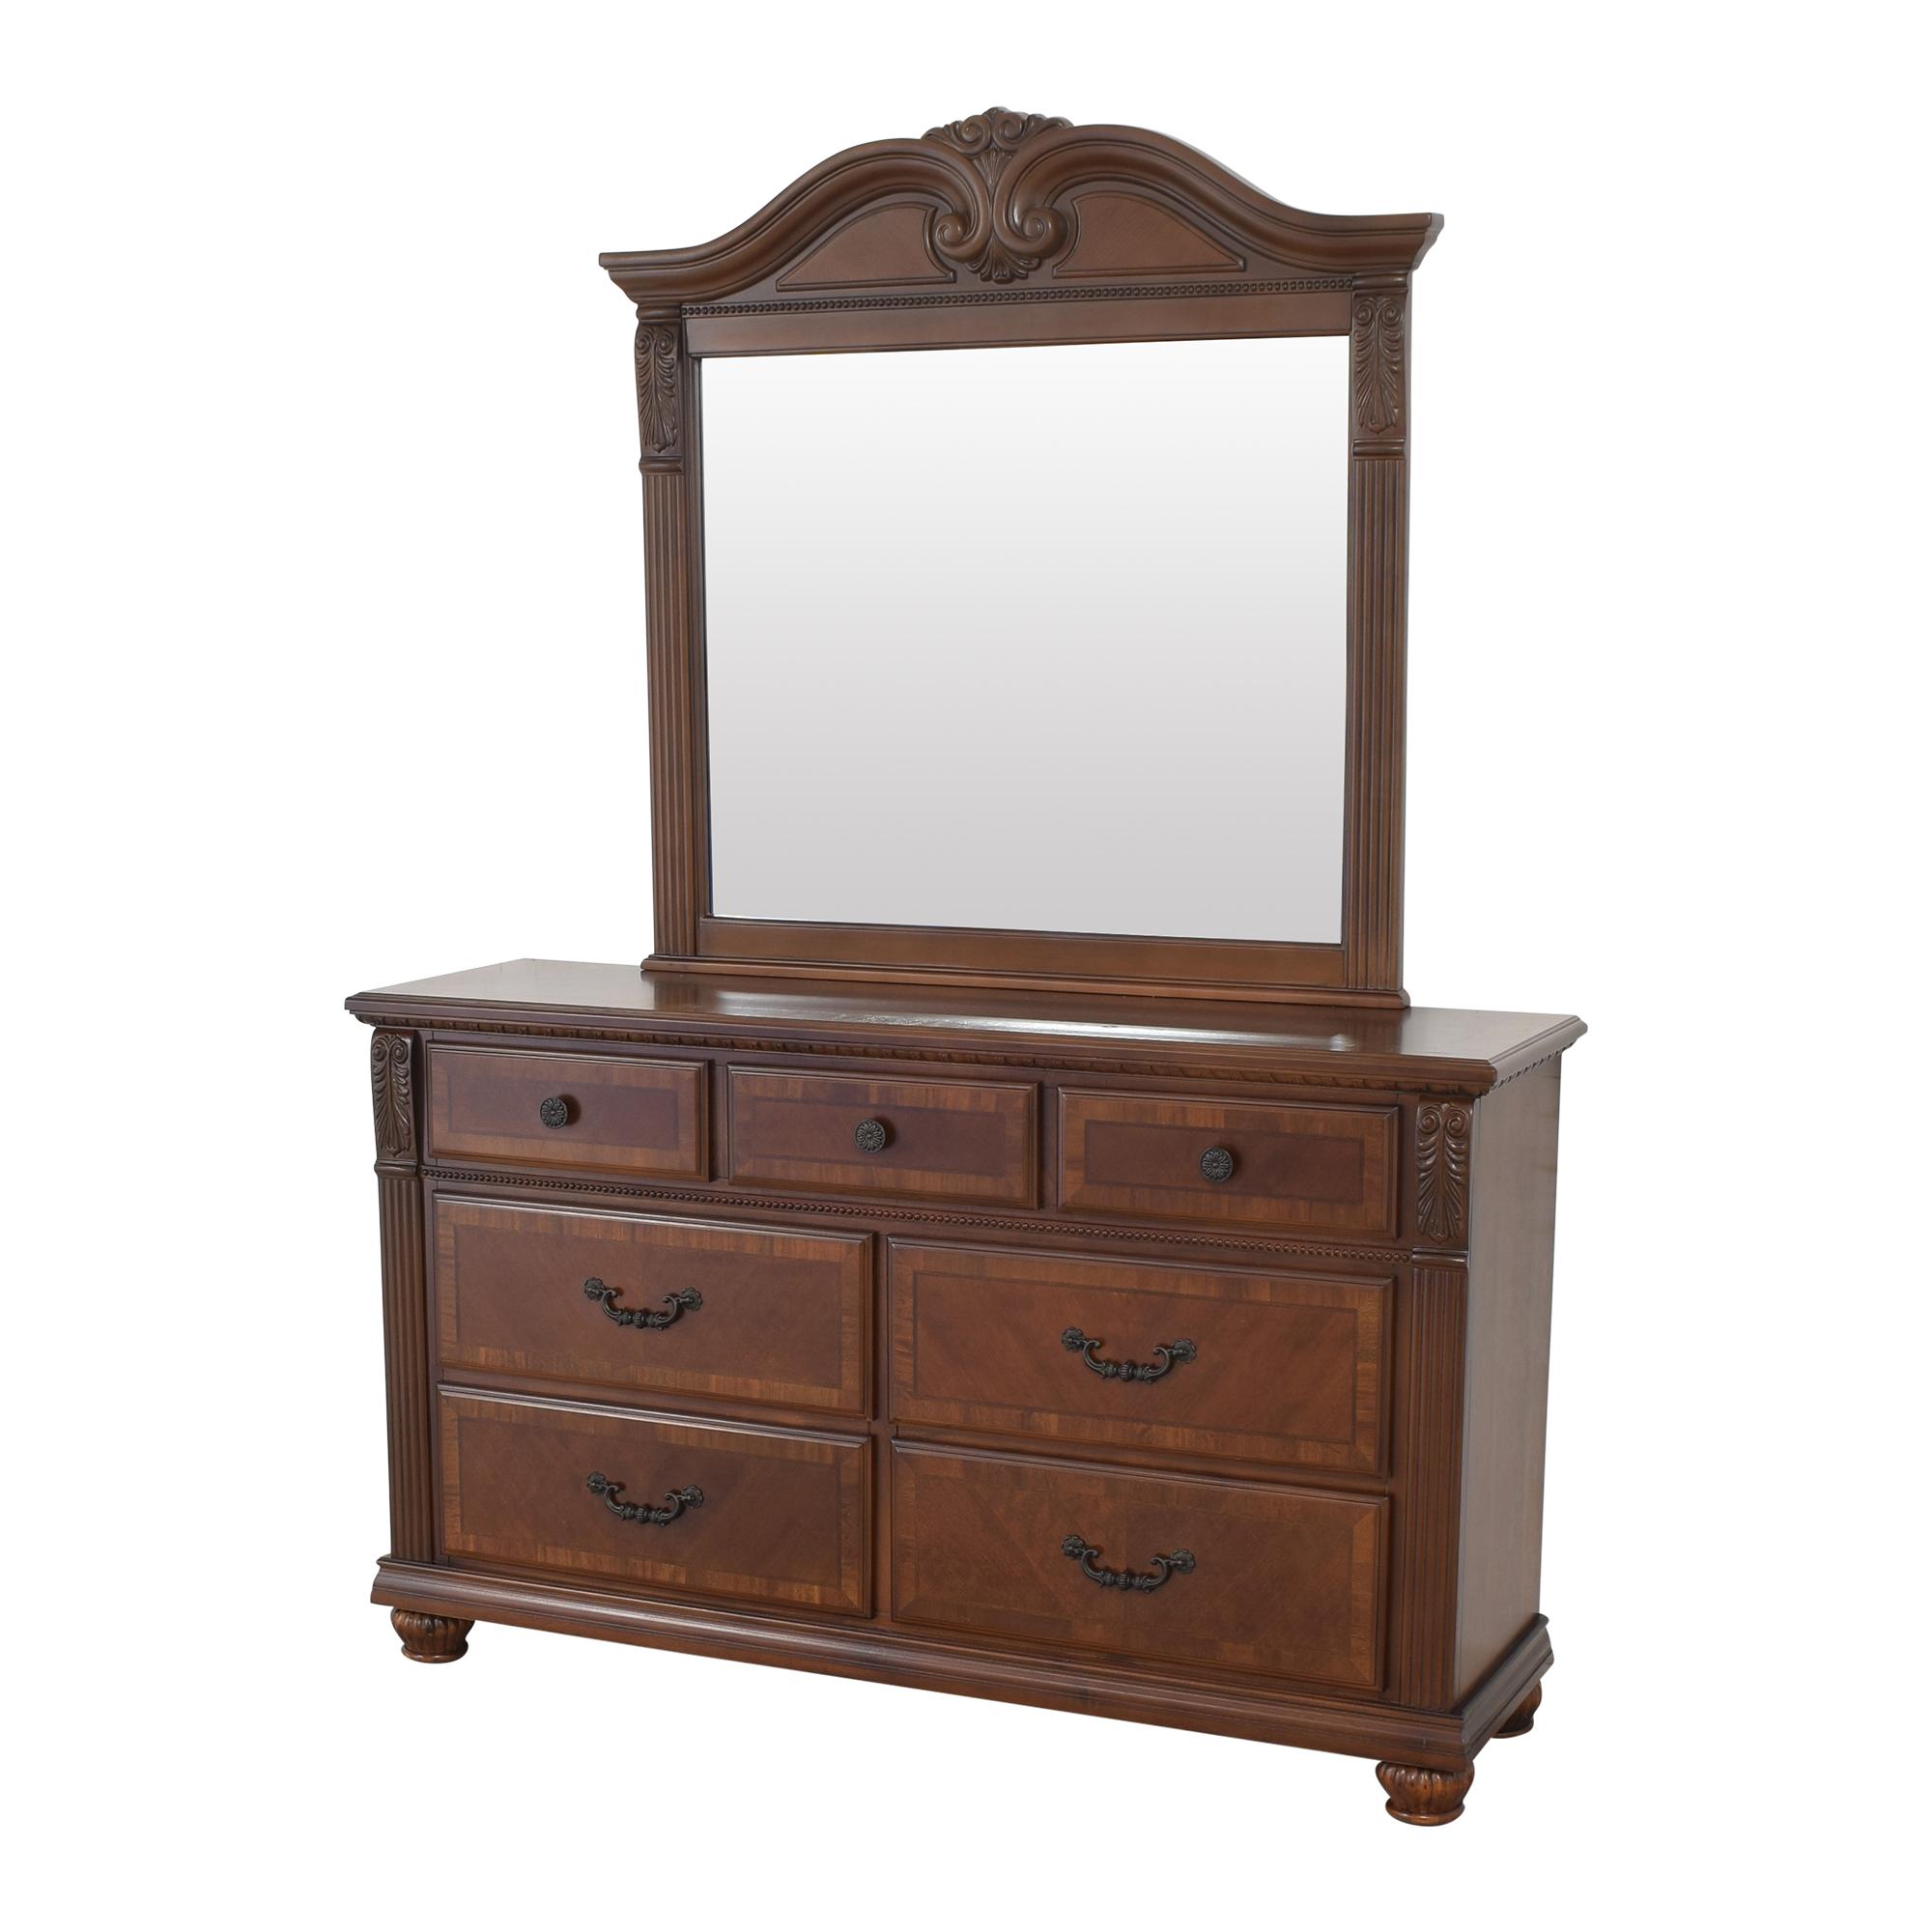 Raymour & Flanigan Raymour & Flanigan Ashbury Dresser with Mirror on sale